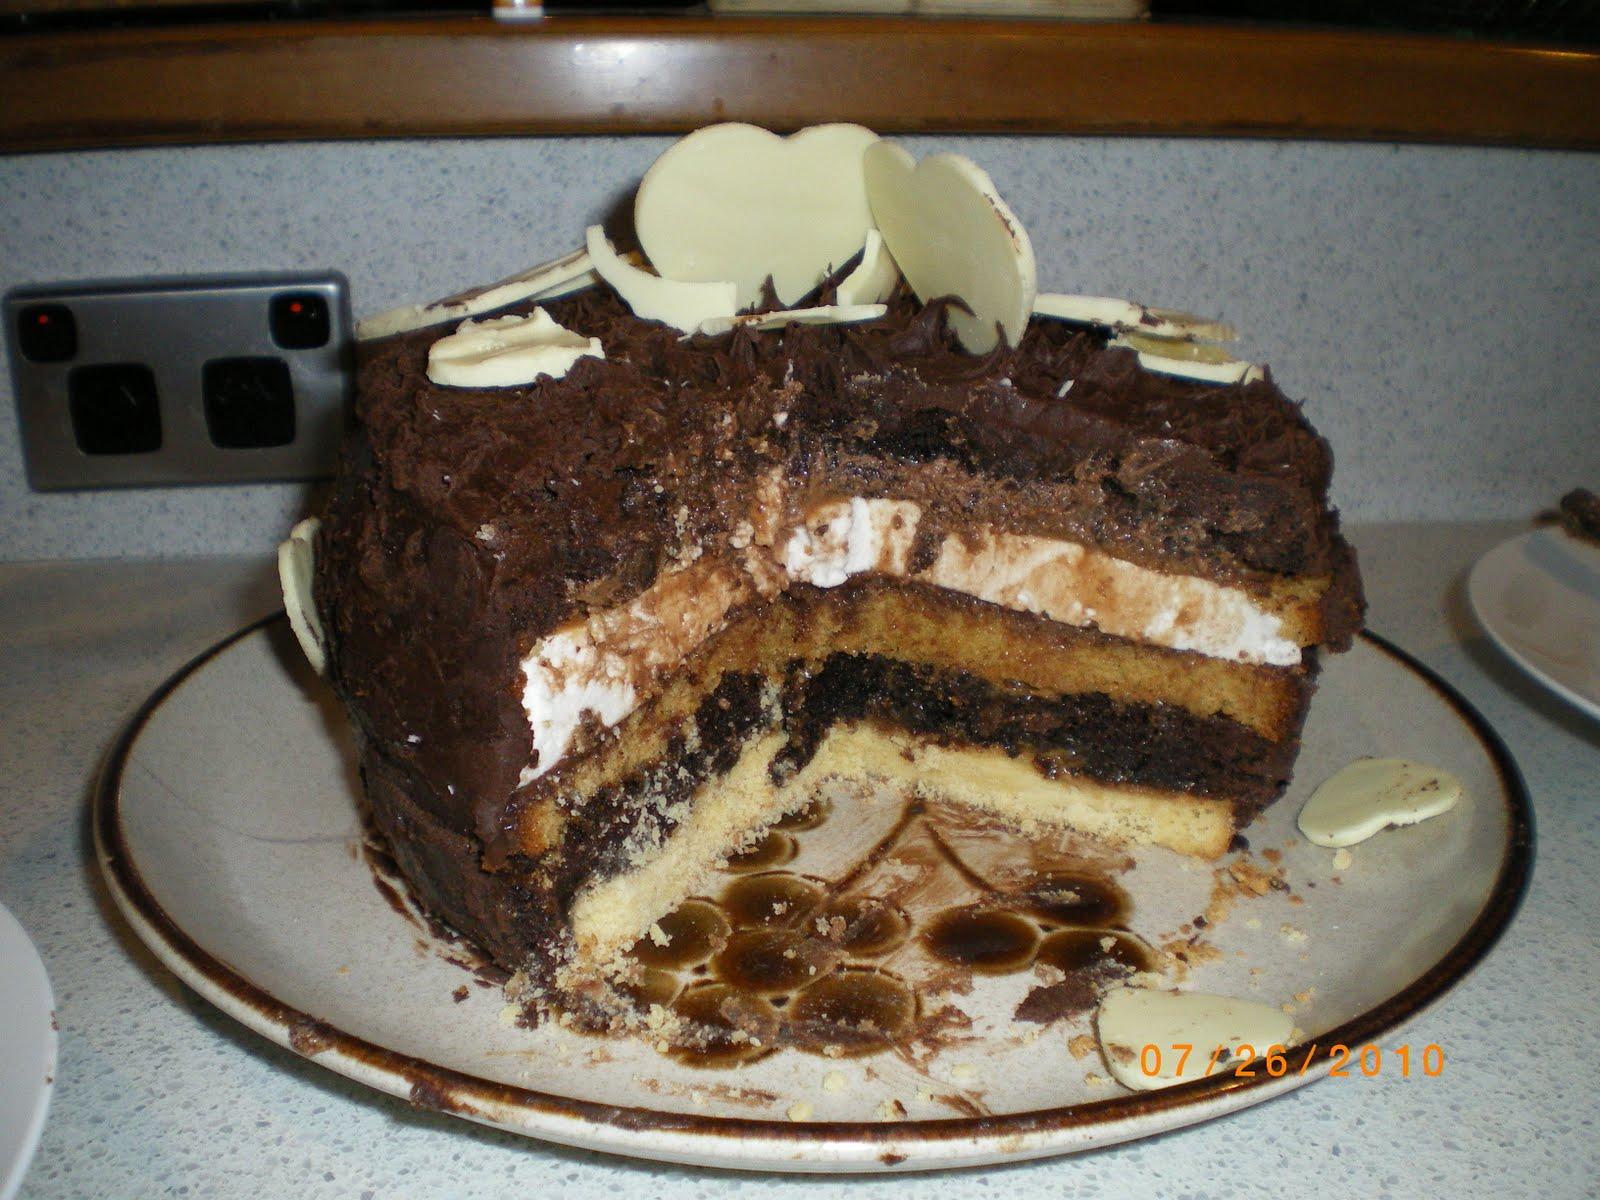 Masterchef Cake Layering Kit